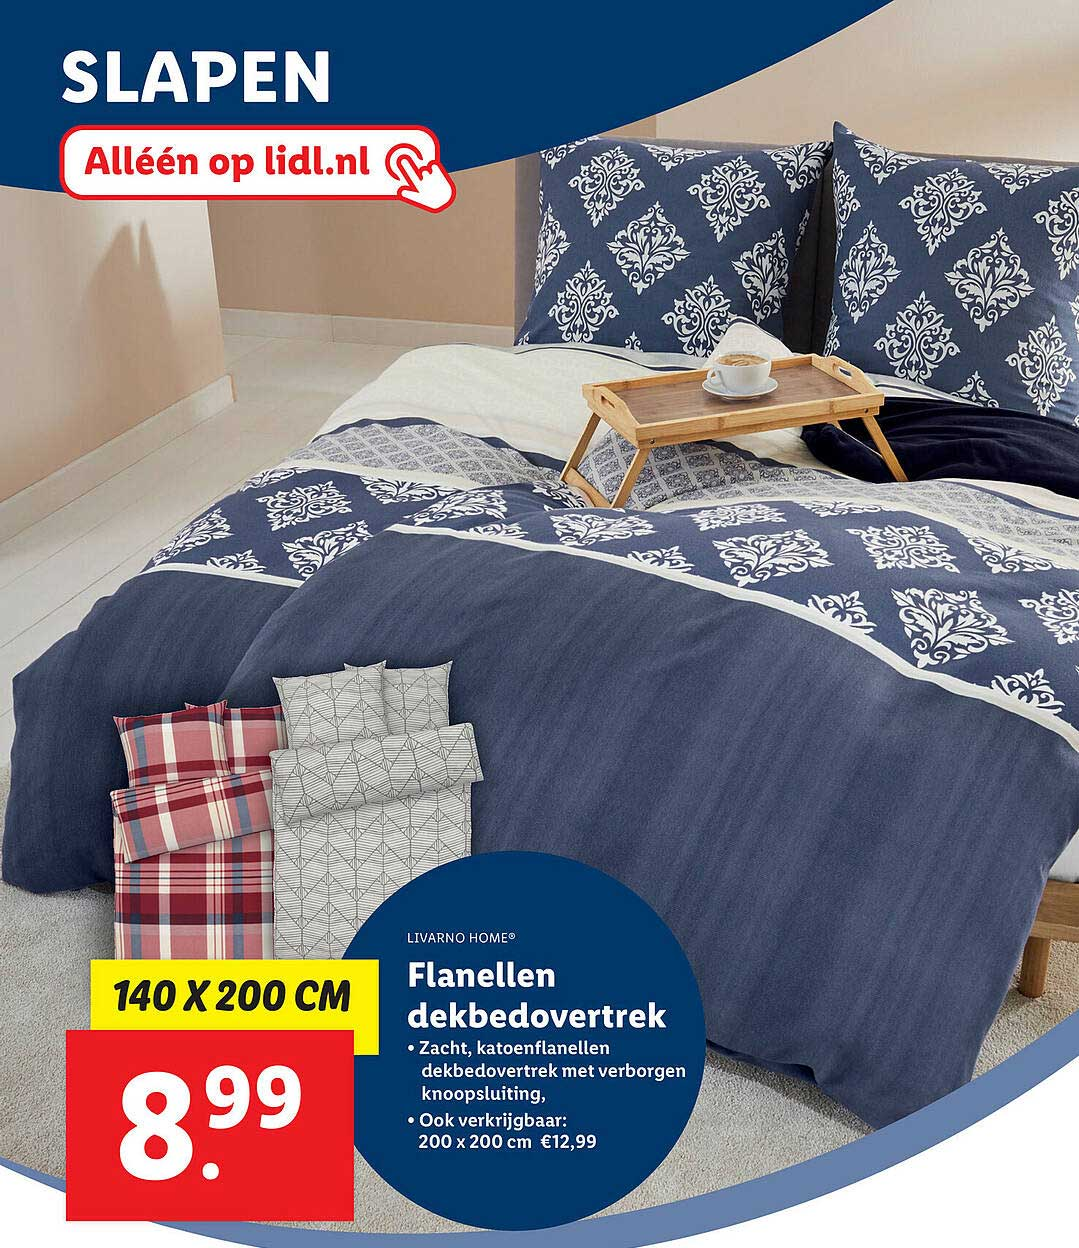 Lidl Shop Livarno Home® Flanellen Dekbedovertrek